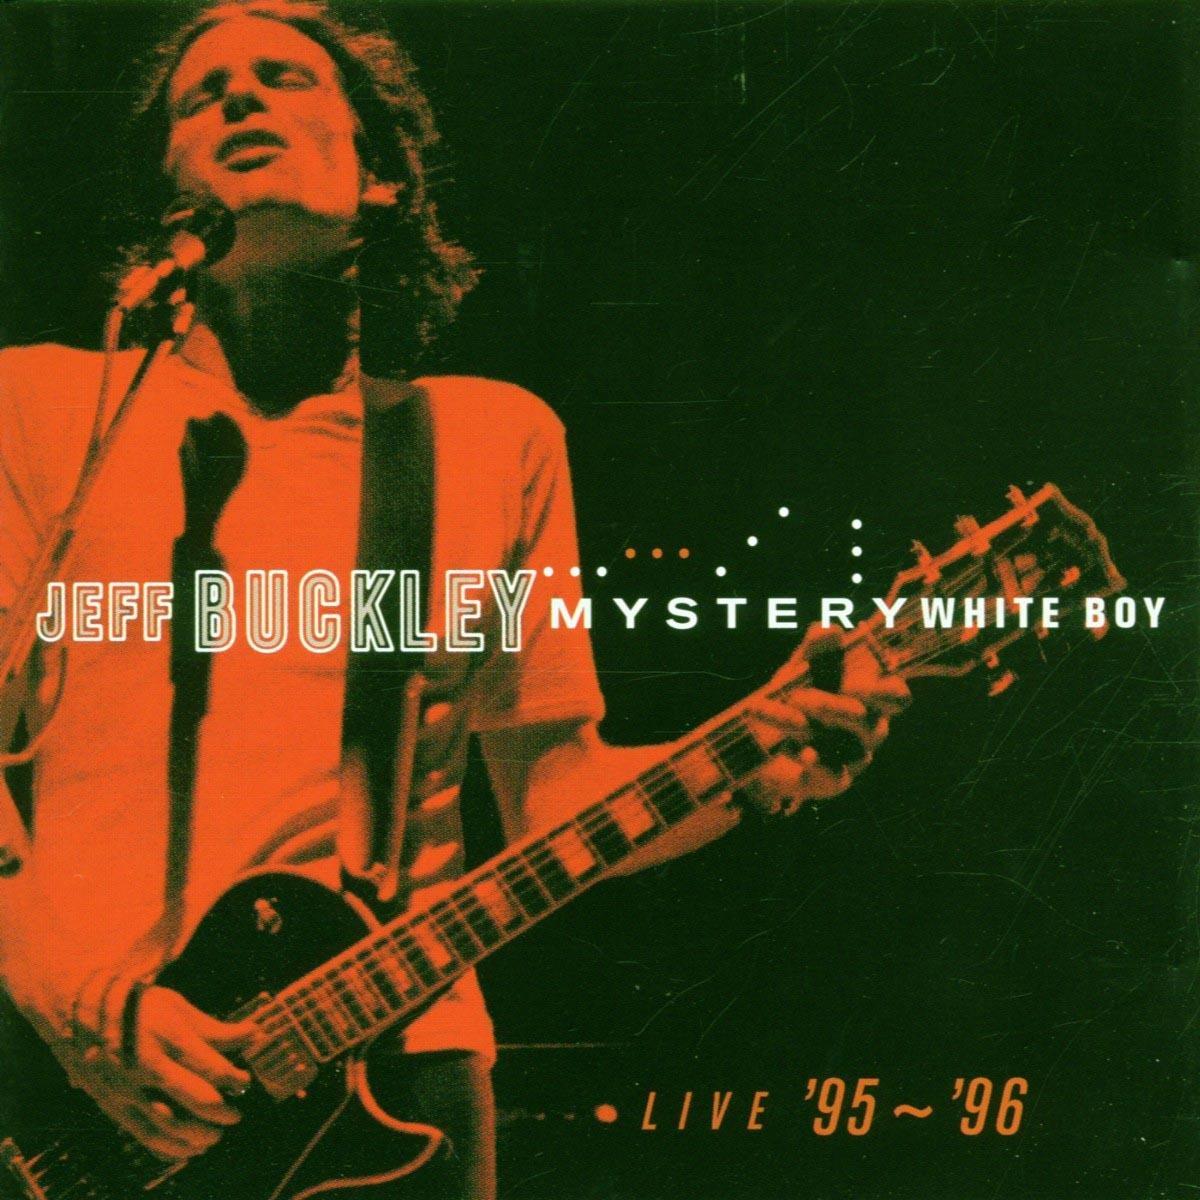 Mystery White Boy [Vinyl] by Sony Music Canada Inc.